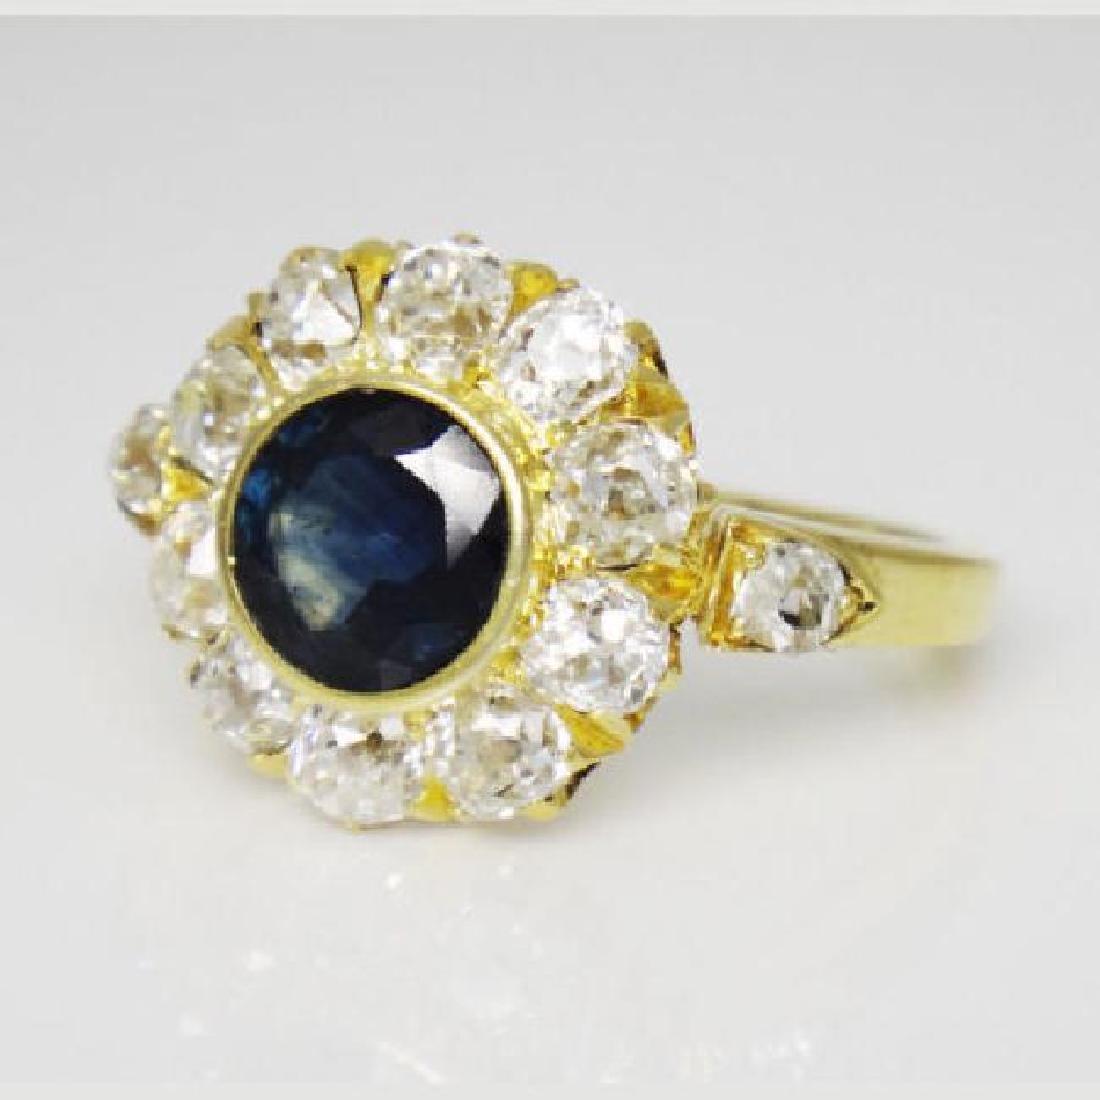 Antique Cluster 18K 2.5CT Diamond & Sapphire Ring